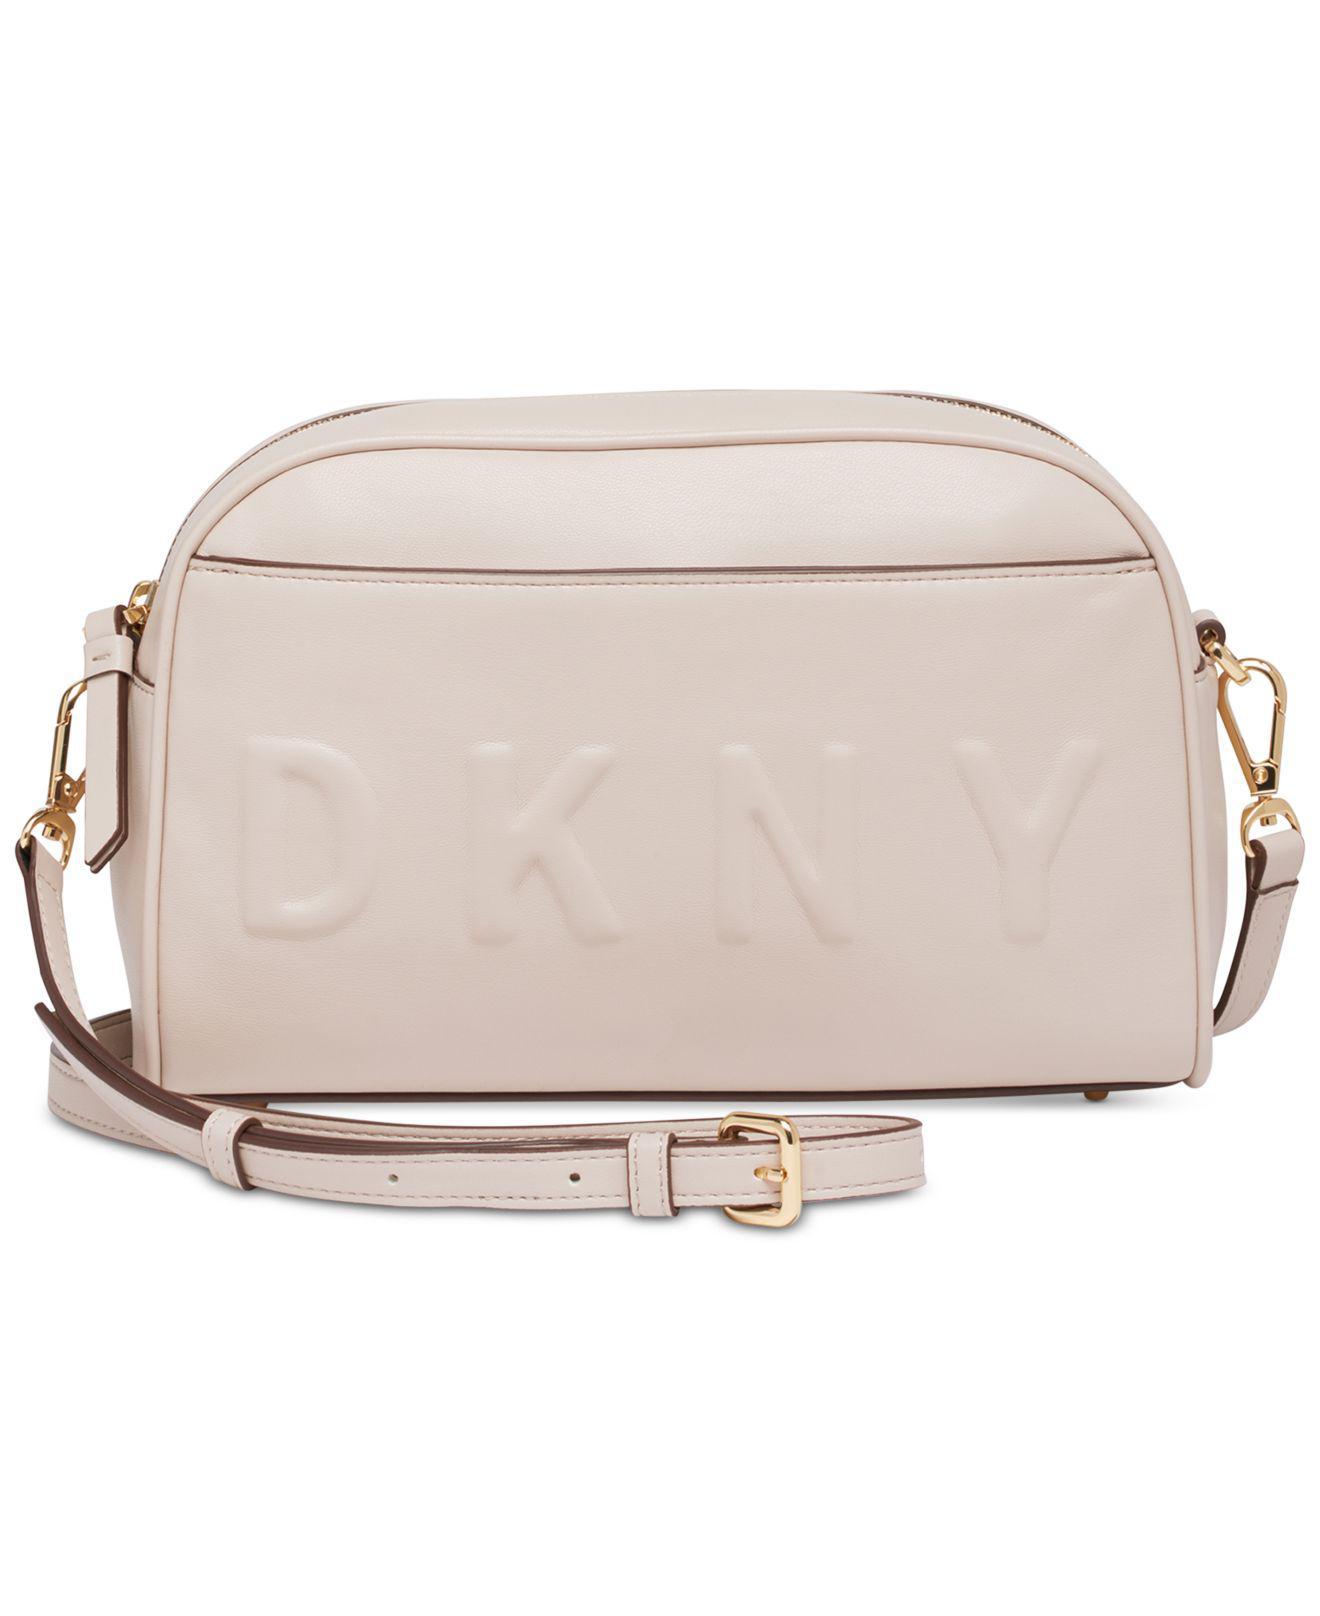 Cross Body Bags - Tilly Camera Crossbody Bag Grey - grey - Cross Body Bags for ladies DKNY UXwiPro7xj